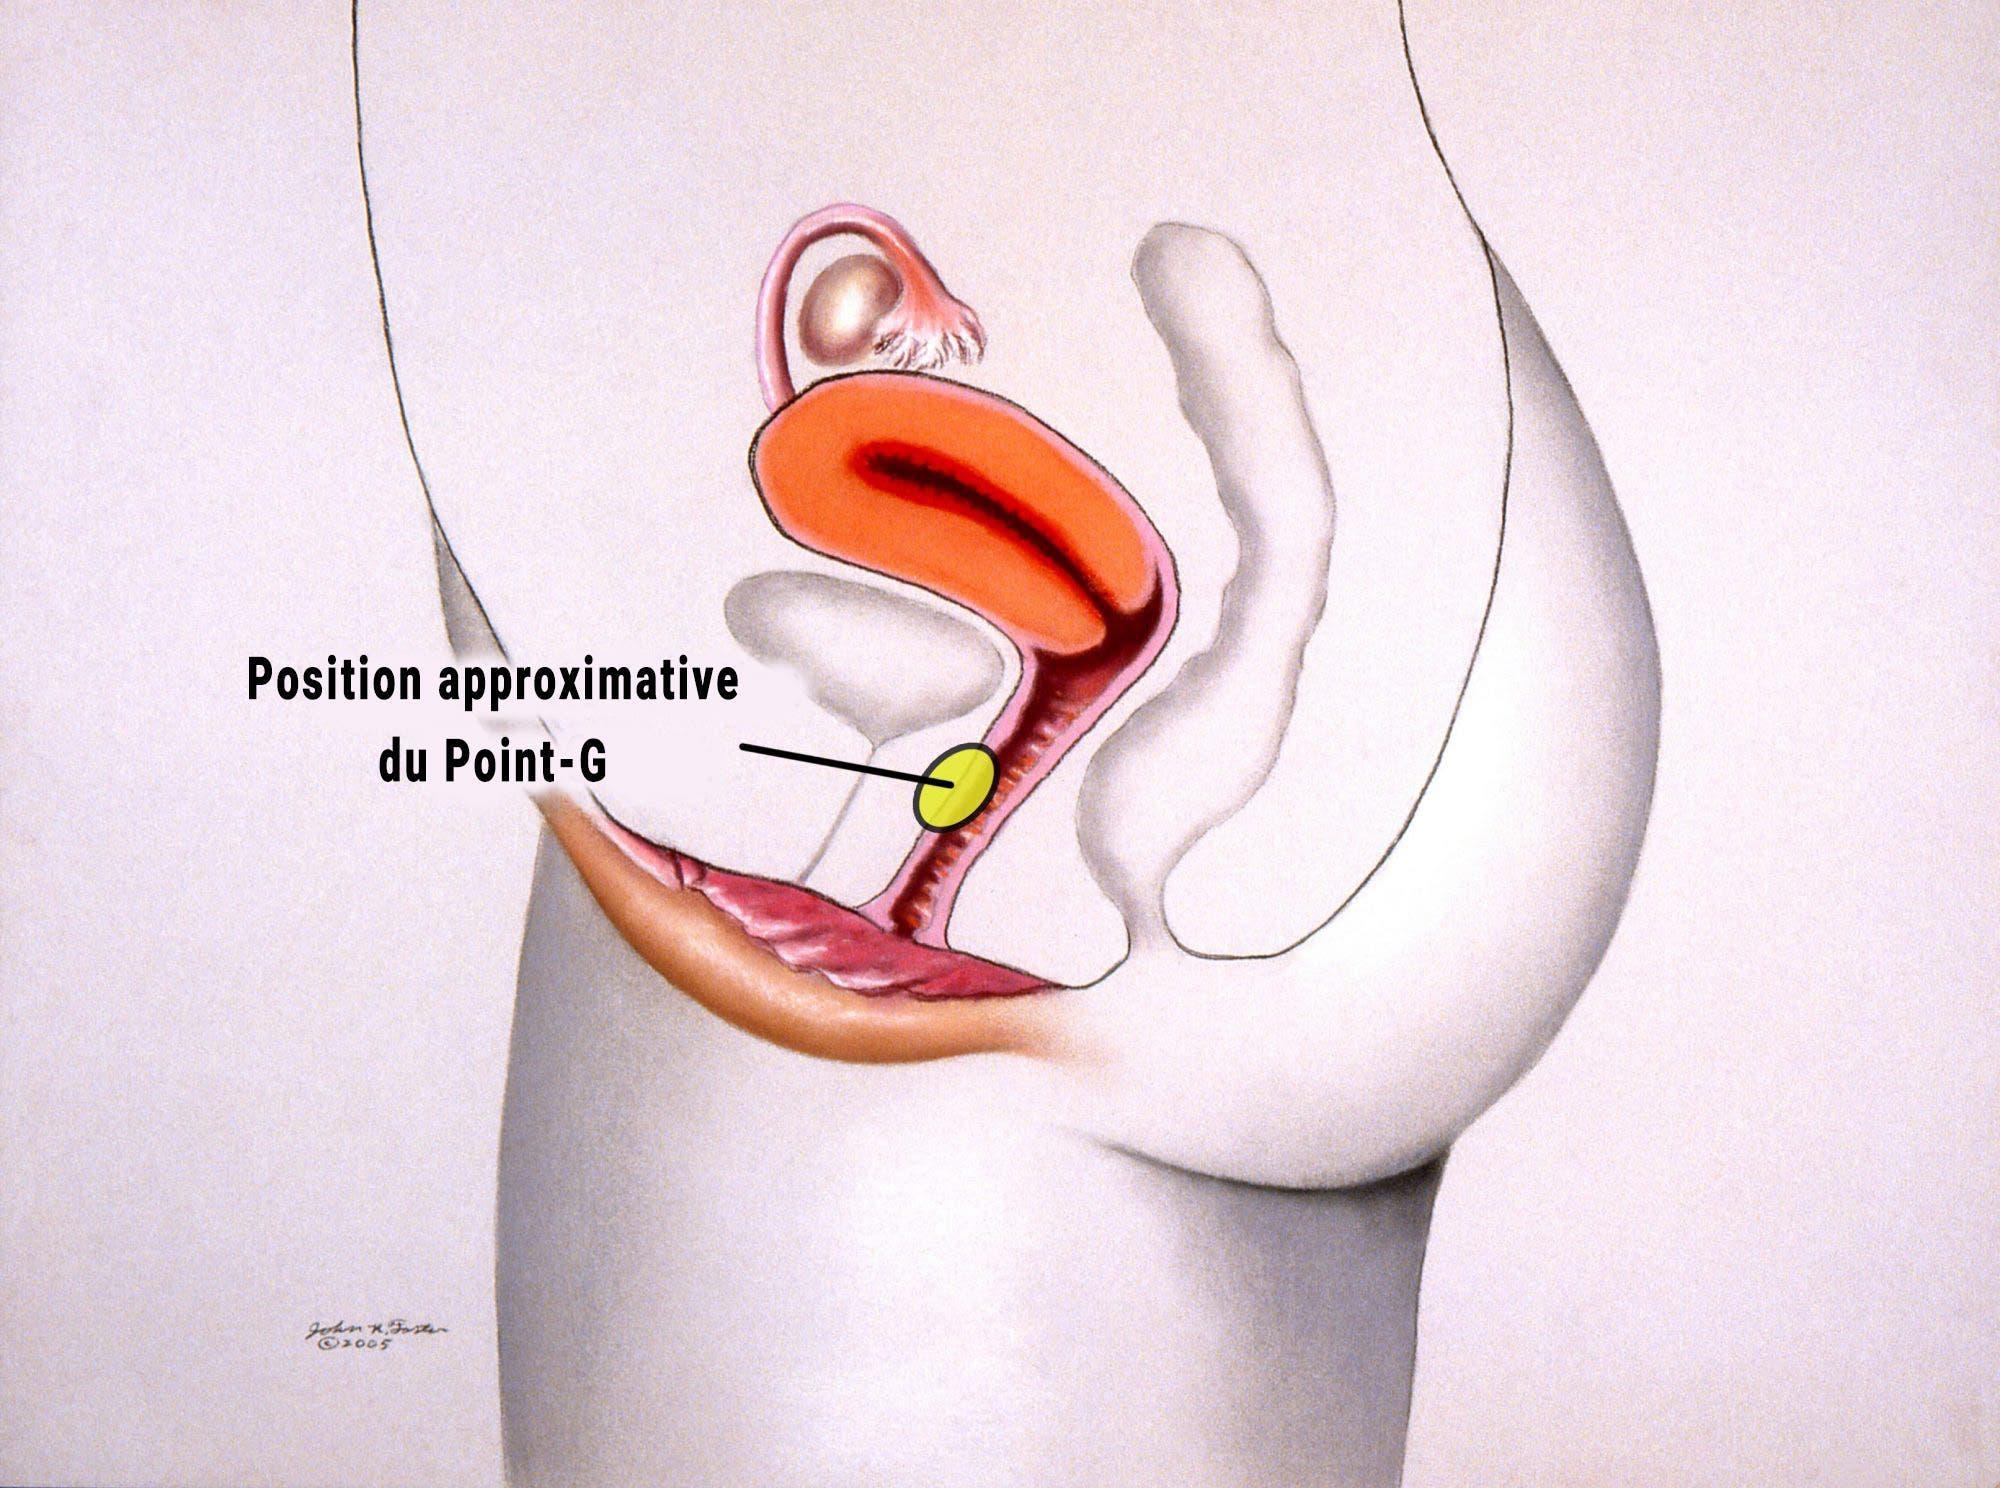 orgasme point g